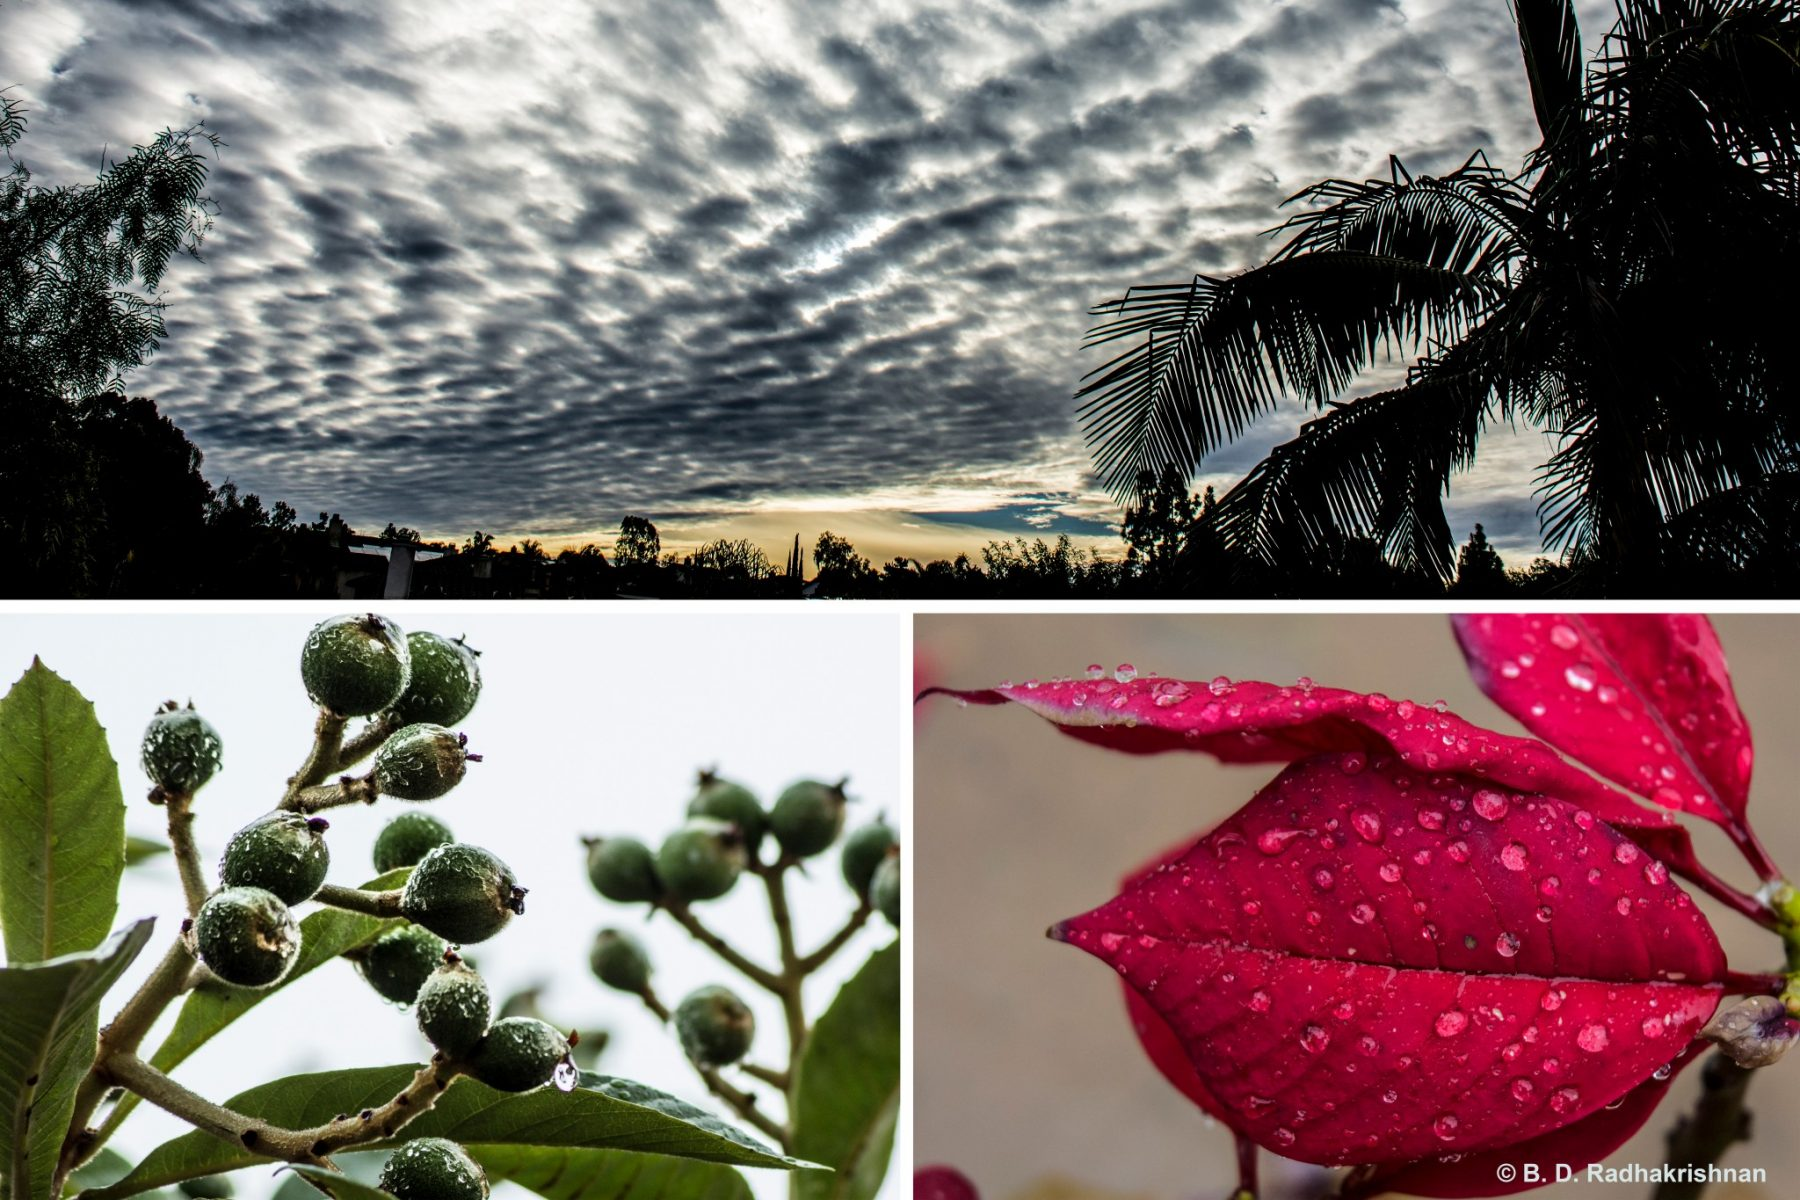 Ben Radhakrishnan - Scripps Ranch Rainy Days Collage